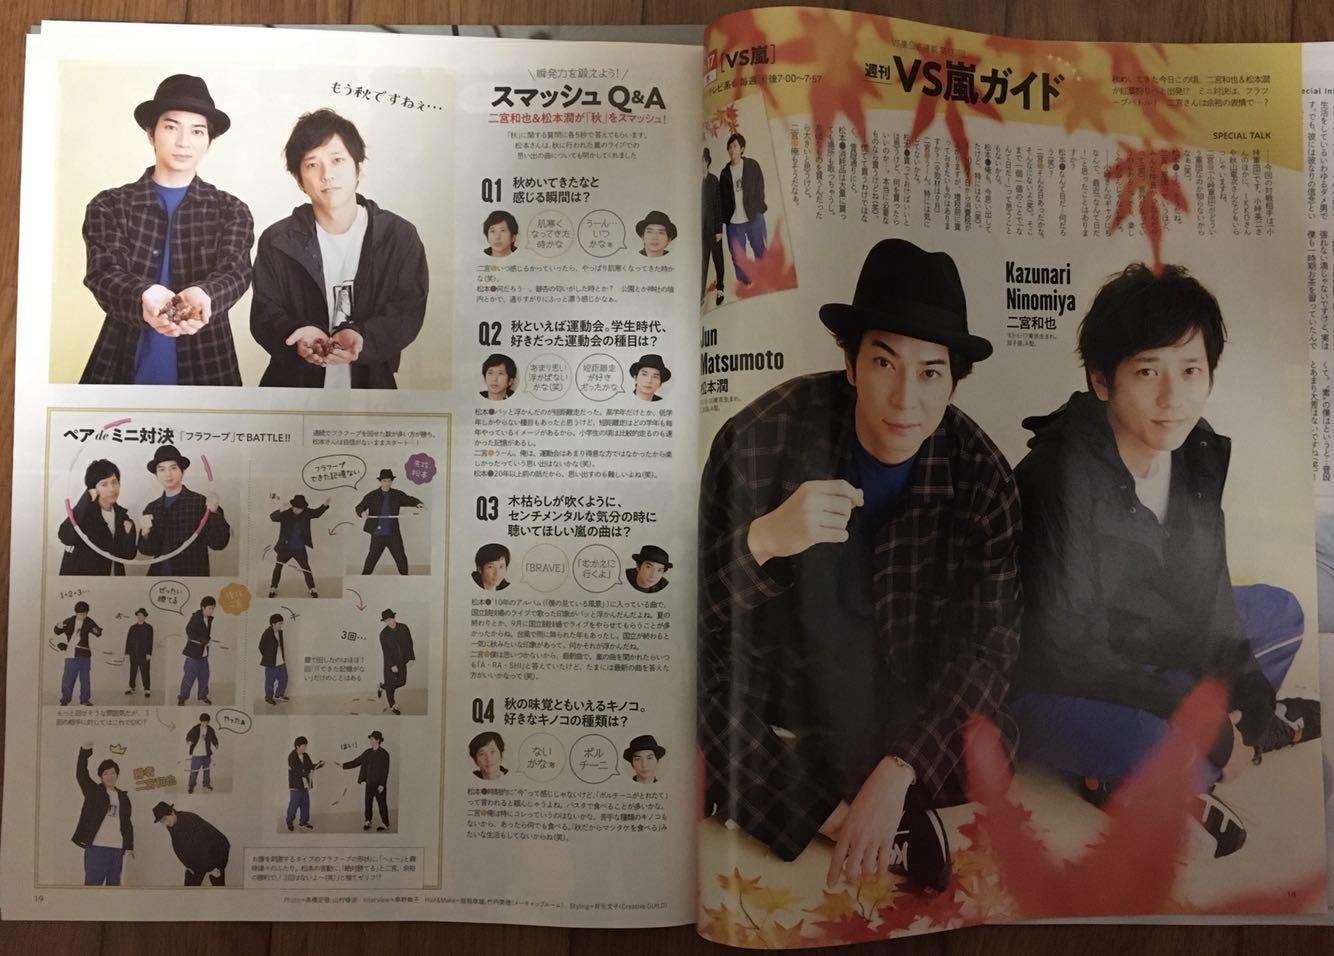 TV Guide2019/10/18 岚 ARASHI 松本润 二宫和也 樱井翔 切页 3P